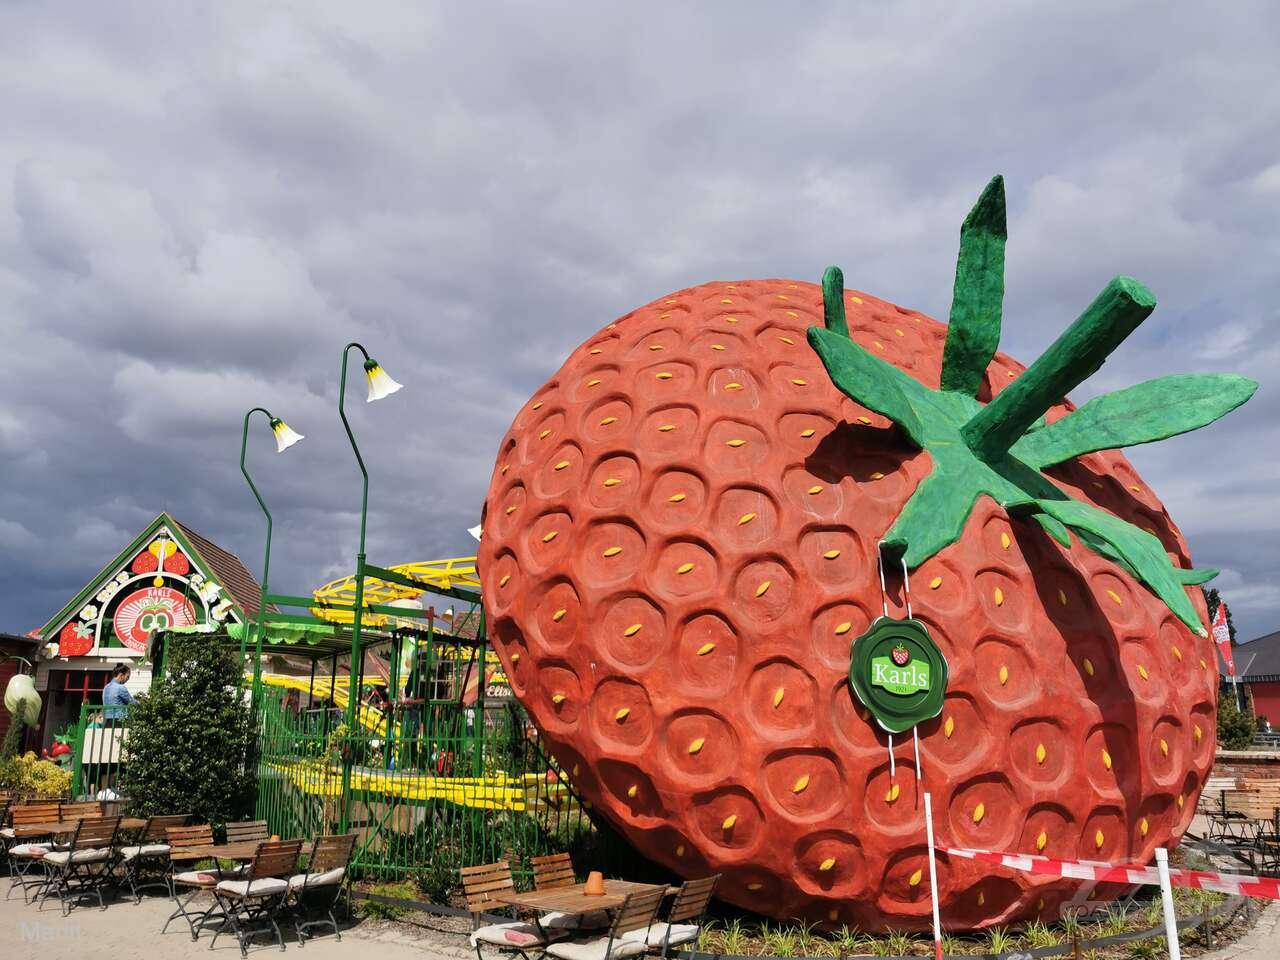 Erdbeer Raupenbahn im Park Karls Erlebnis-Dorf Koserow Impressionen